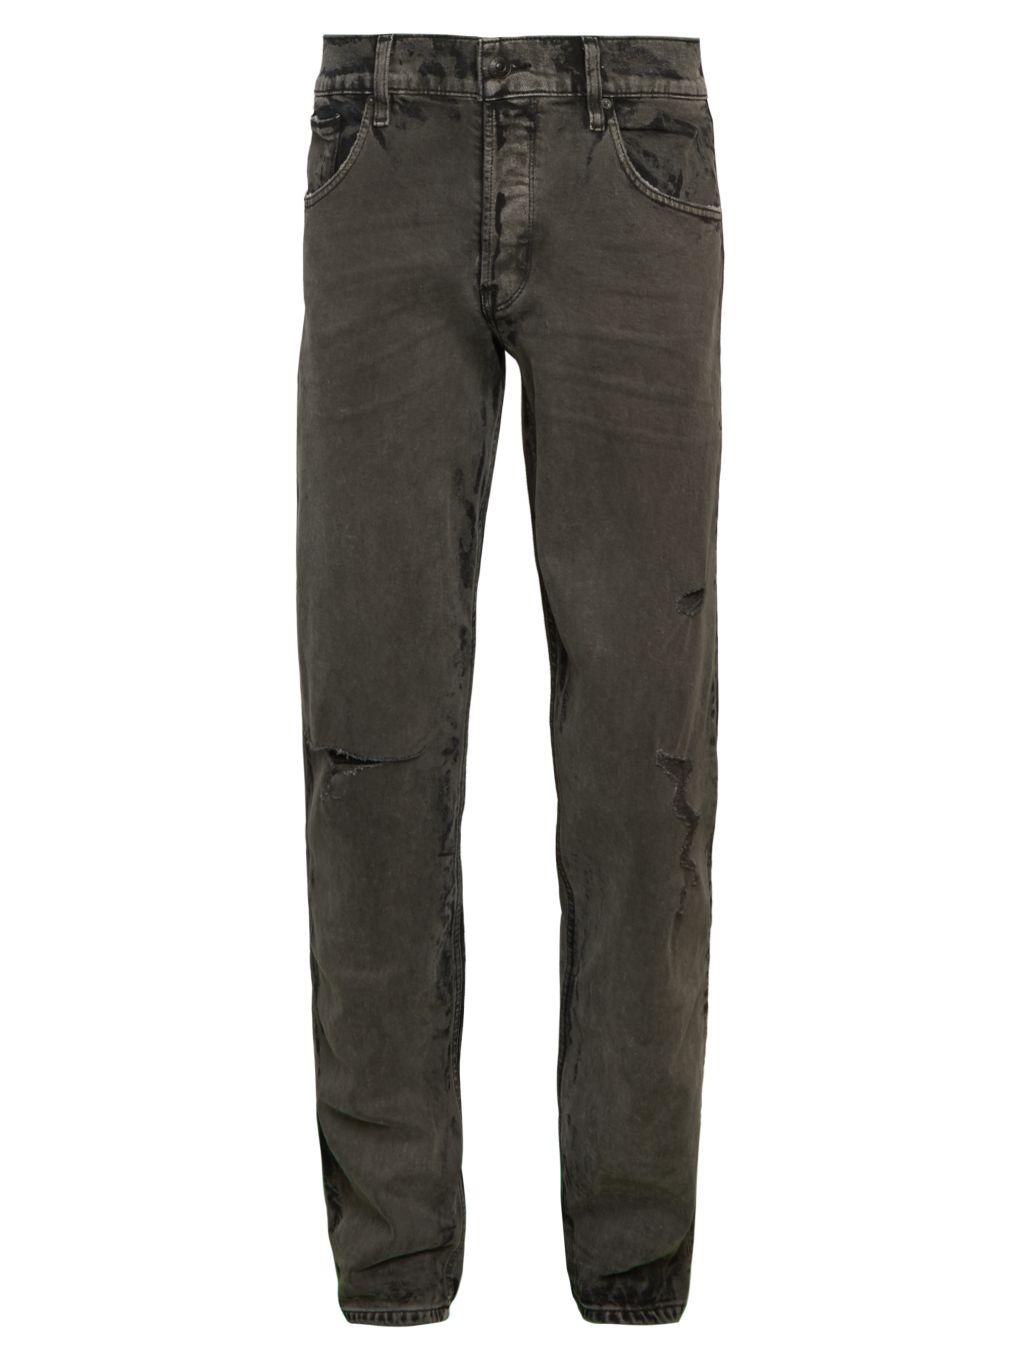 Hudson Jeans Distressed Slim Straight Jeans